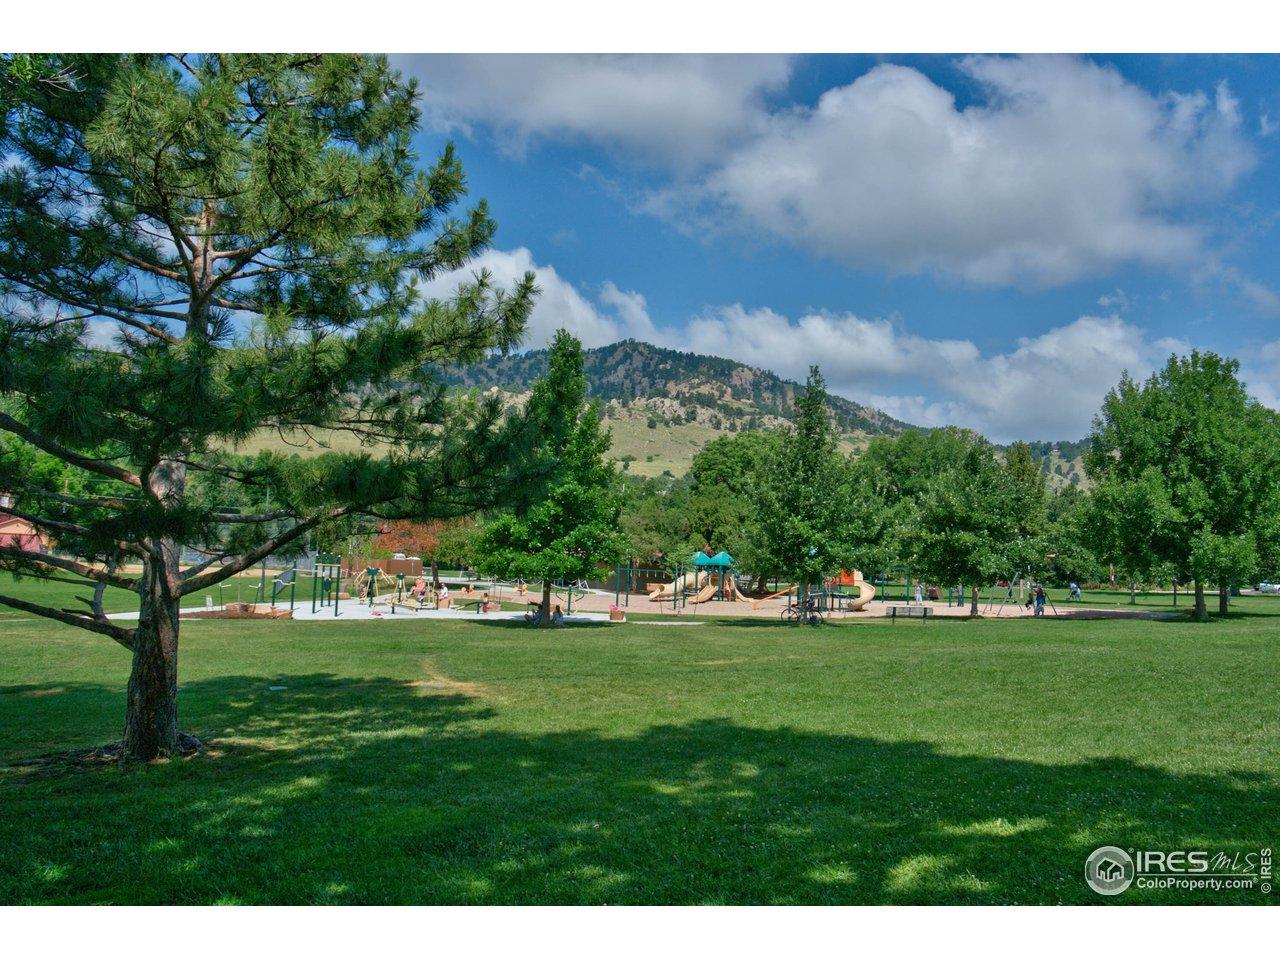 Neighborhood Park/Playground